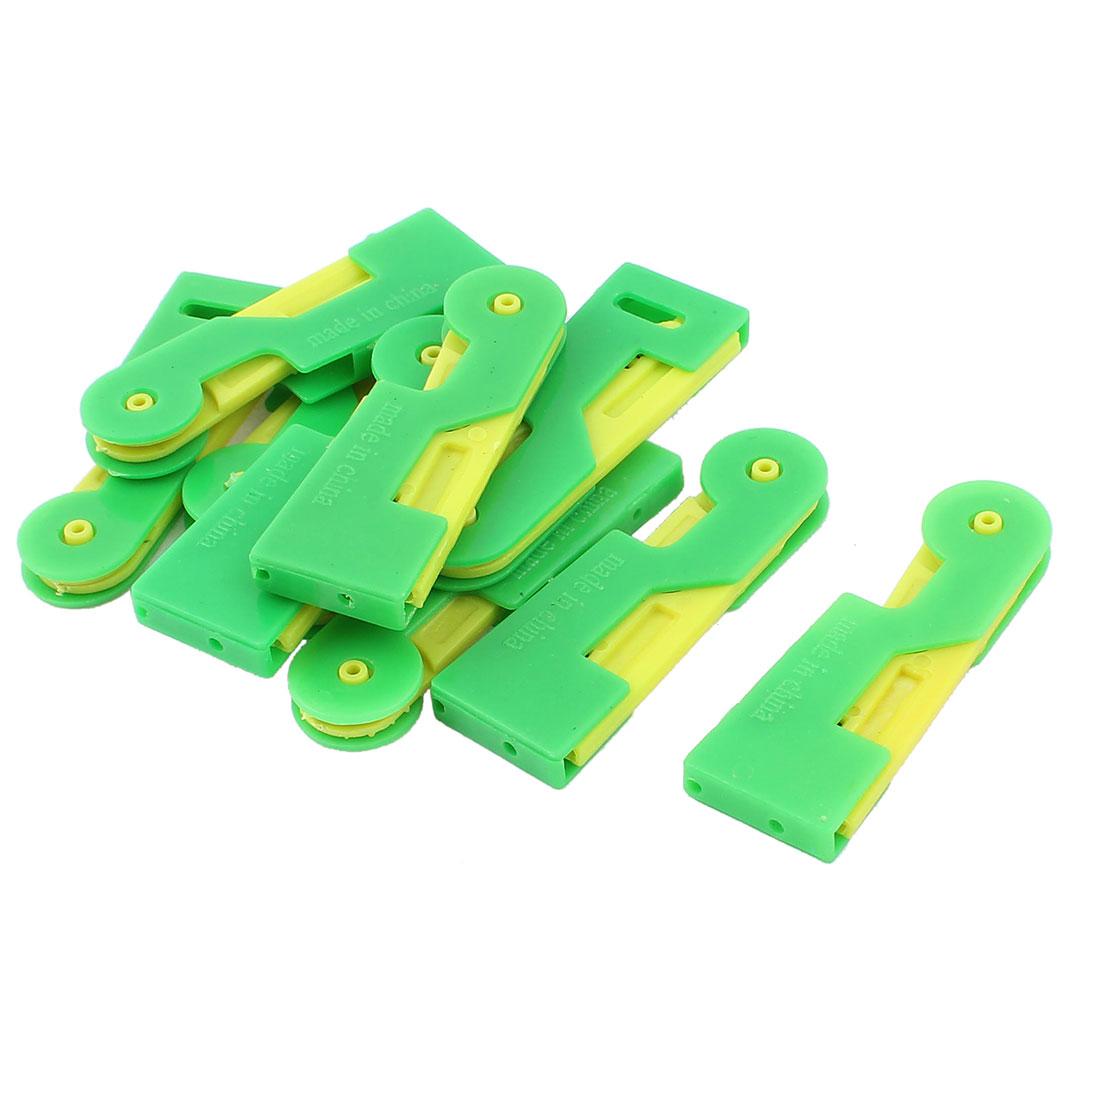 Elder Stitch Sew Hem Automatic Needle Threader Thread Guide Green Yellow 10pcs